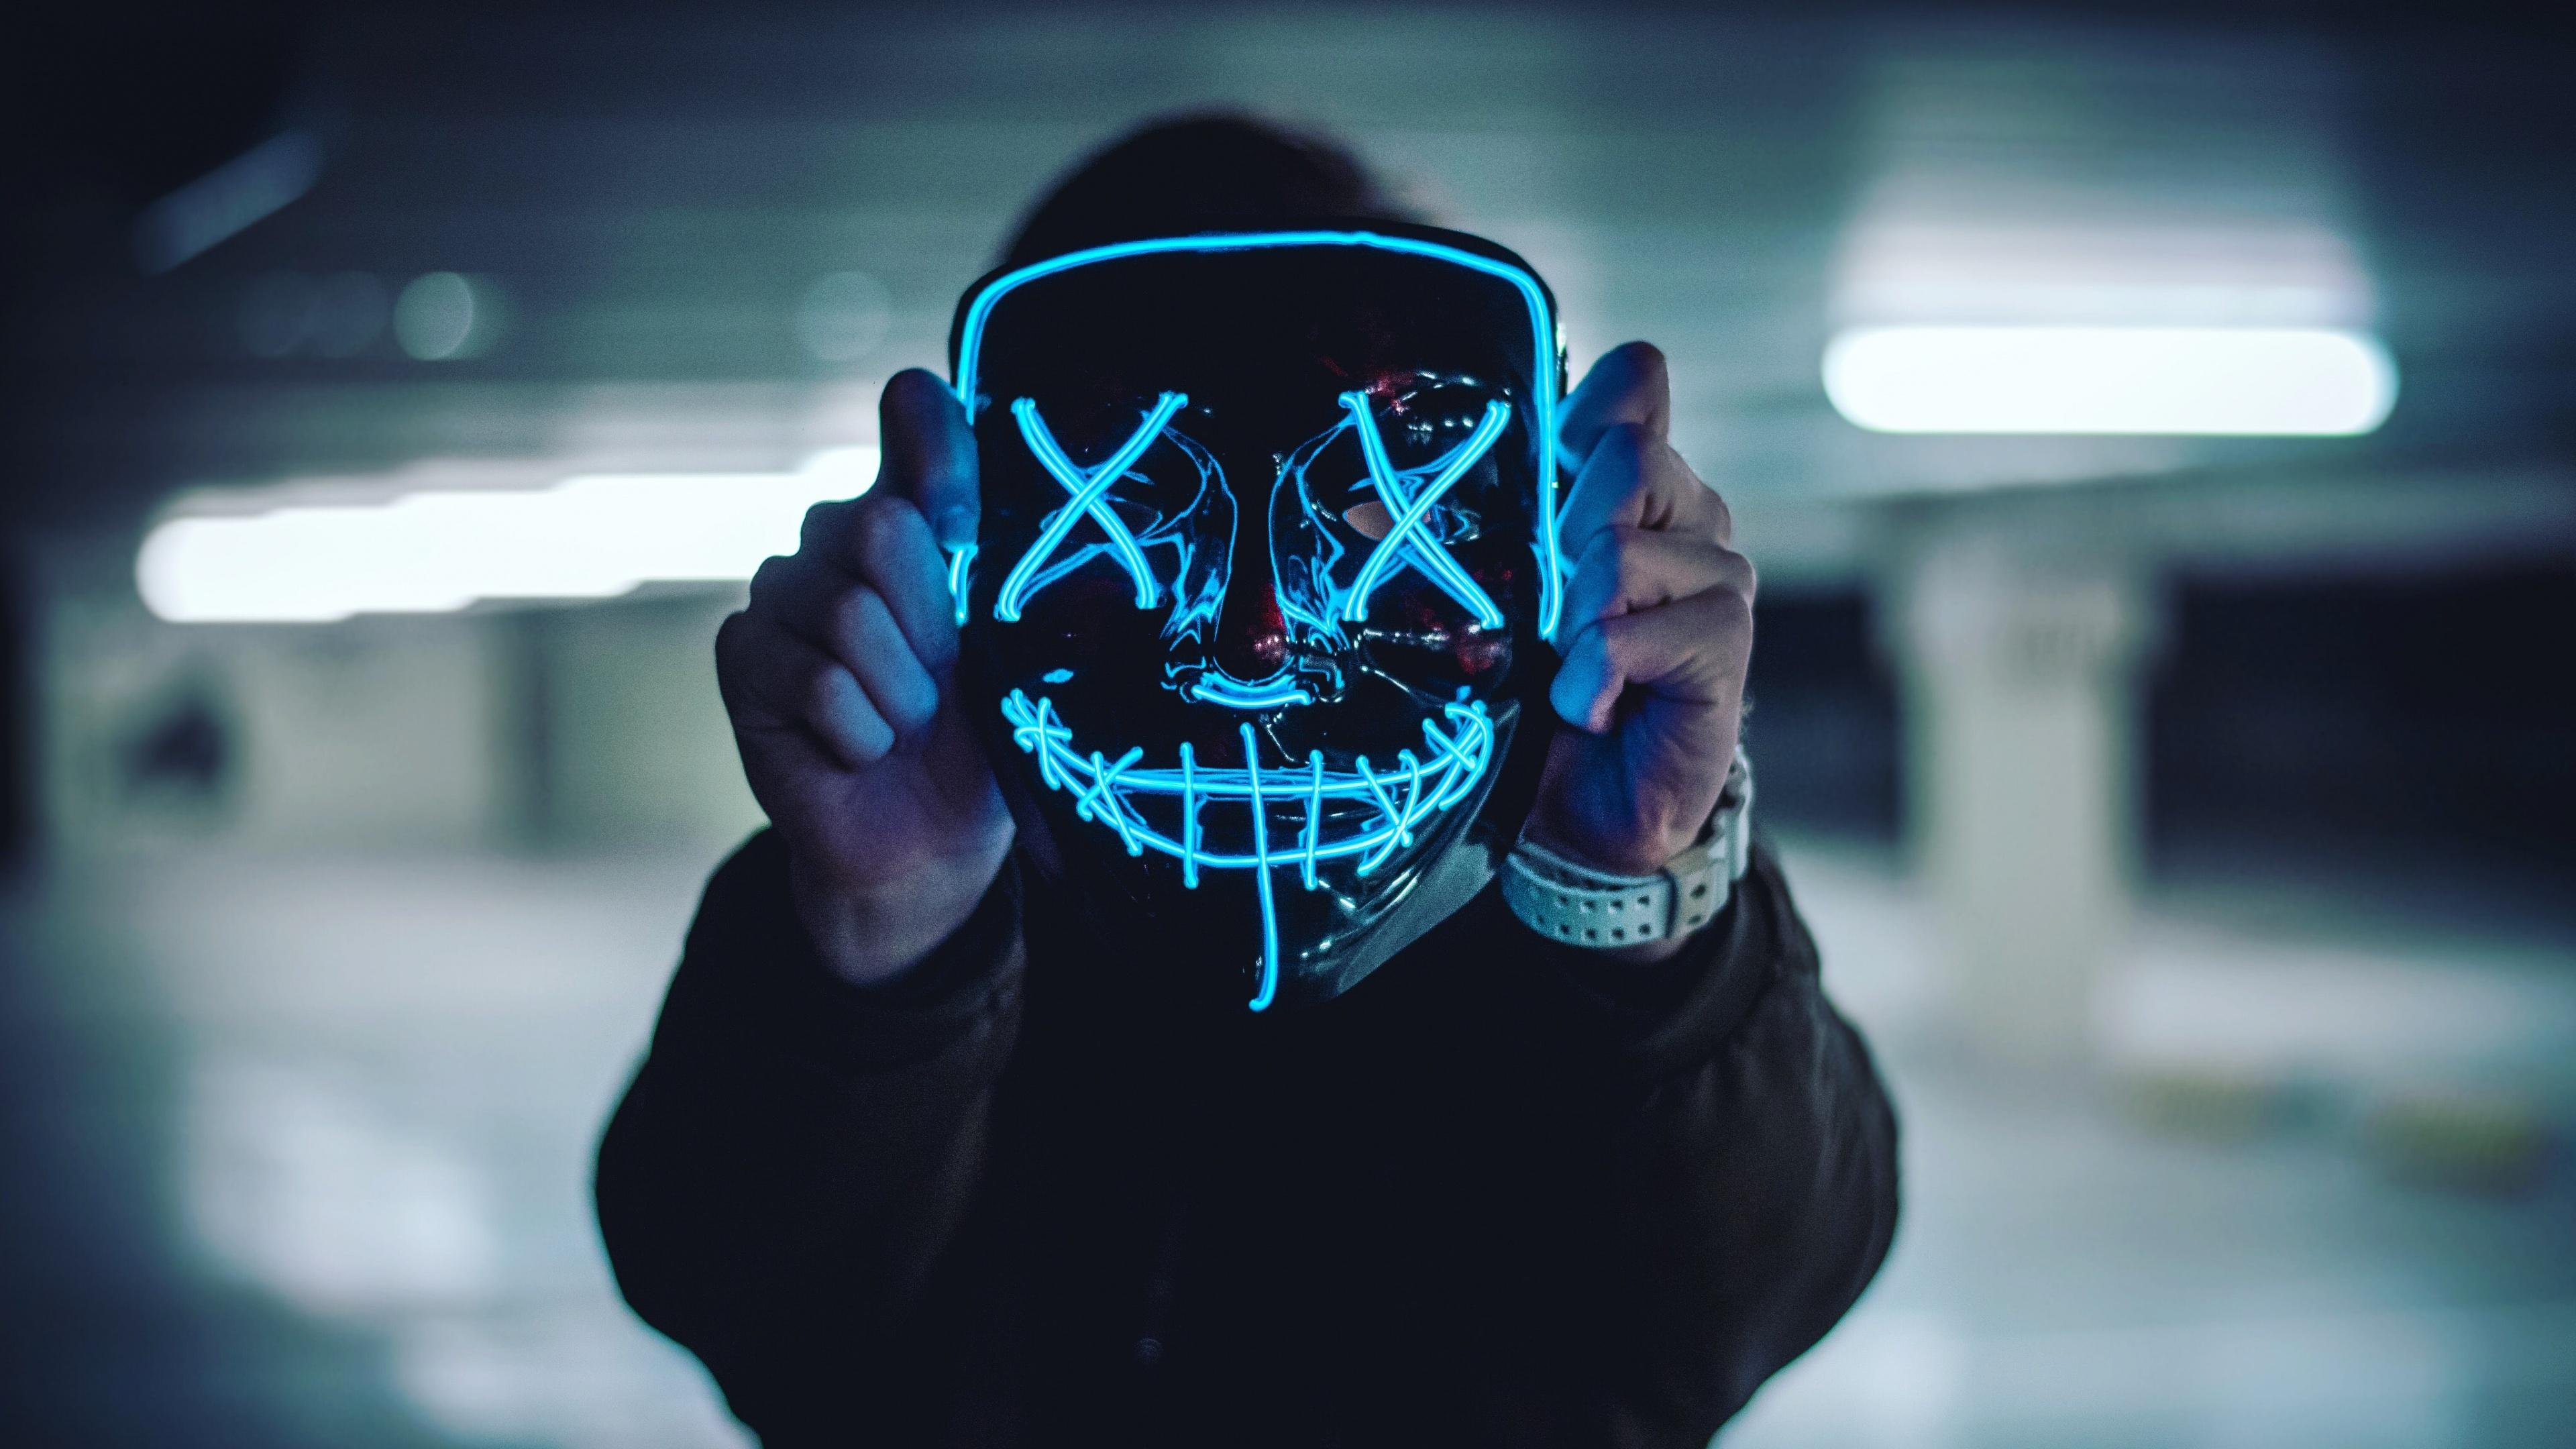 Neon Mask 4k Wallpaper Blue Lights Portrait Anonymous Face Mask Photography 2159